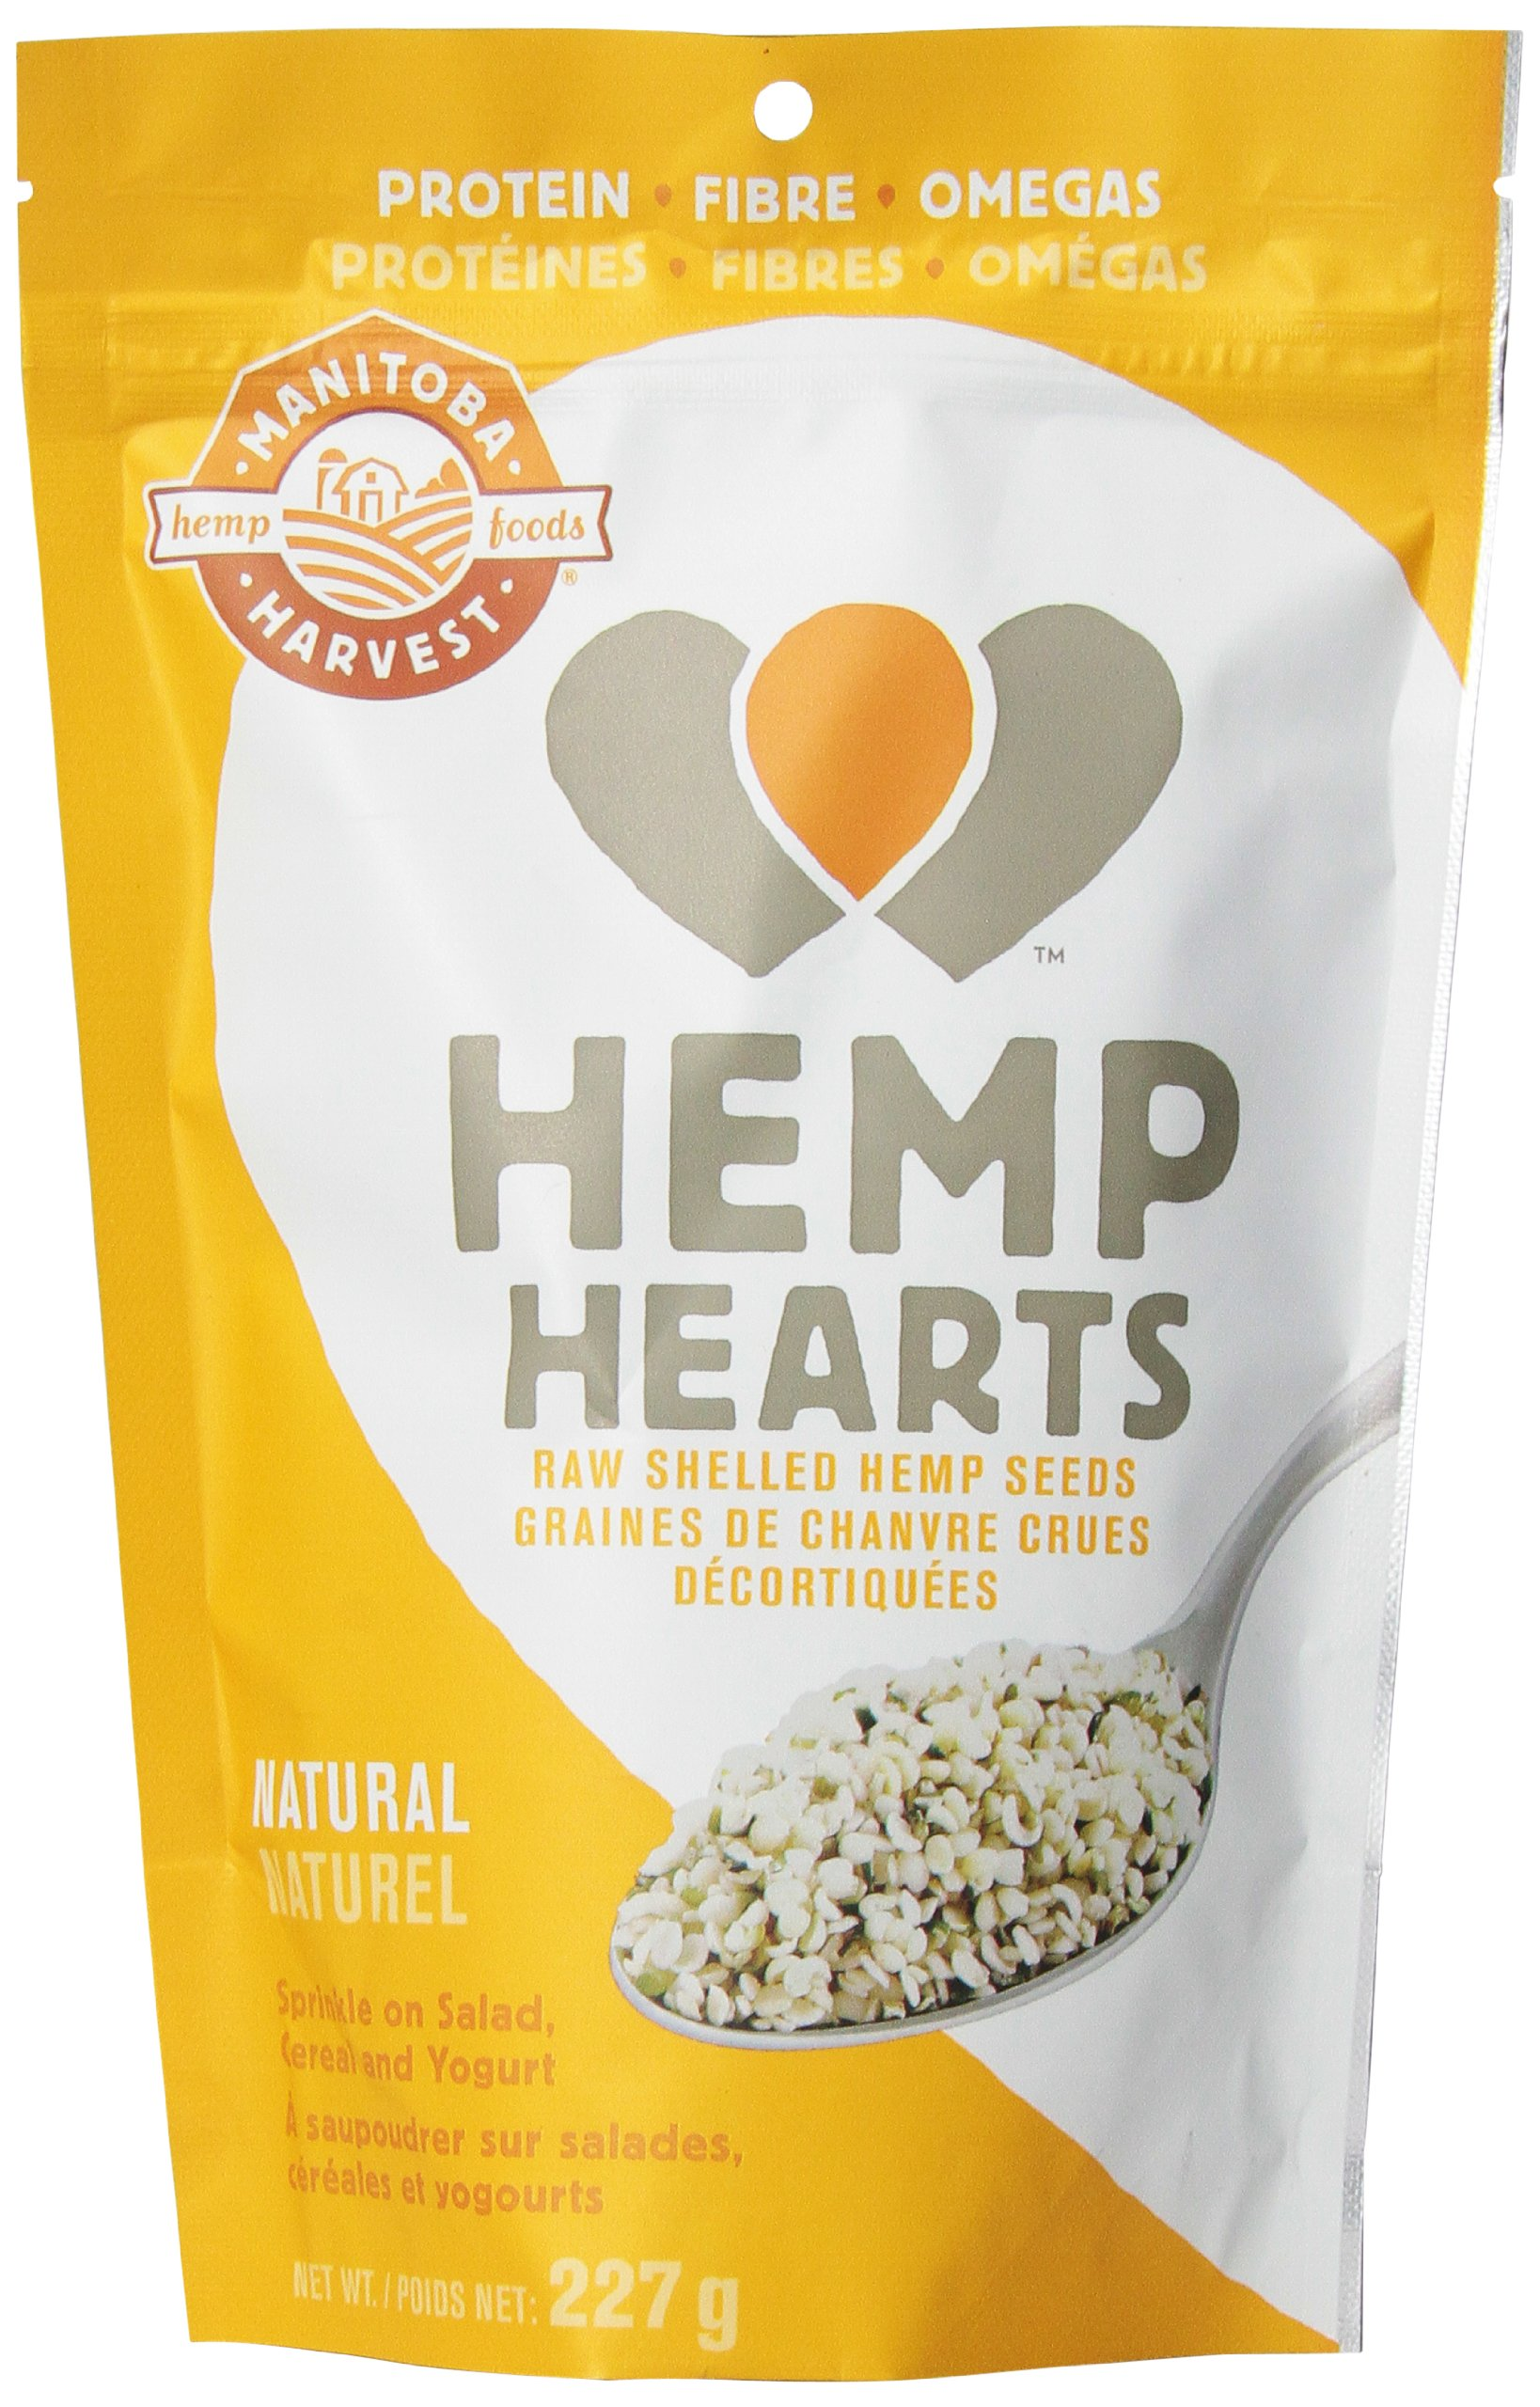 Manitoba Harvest Hemp Hearts Raw Shelled Hemp Seeds, 8 Ounce (Pack of 8)